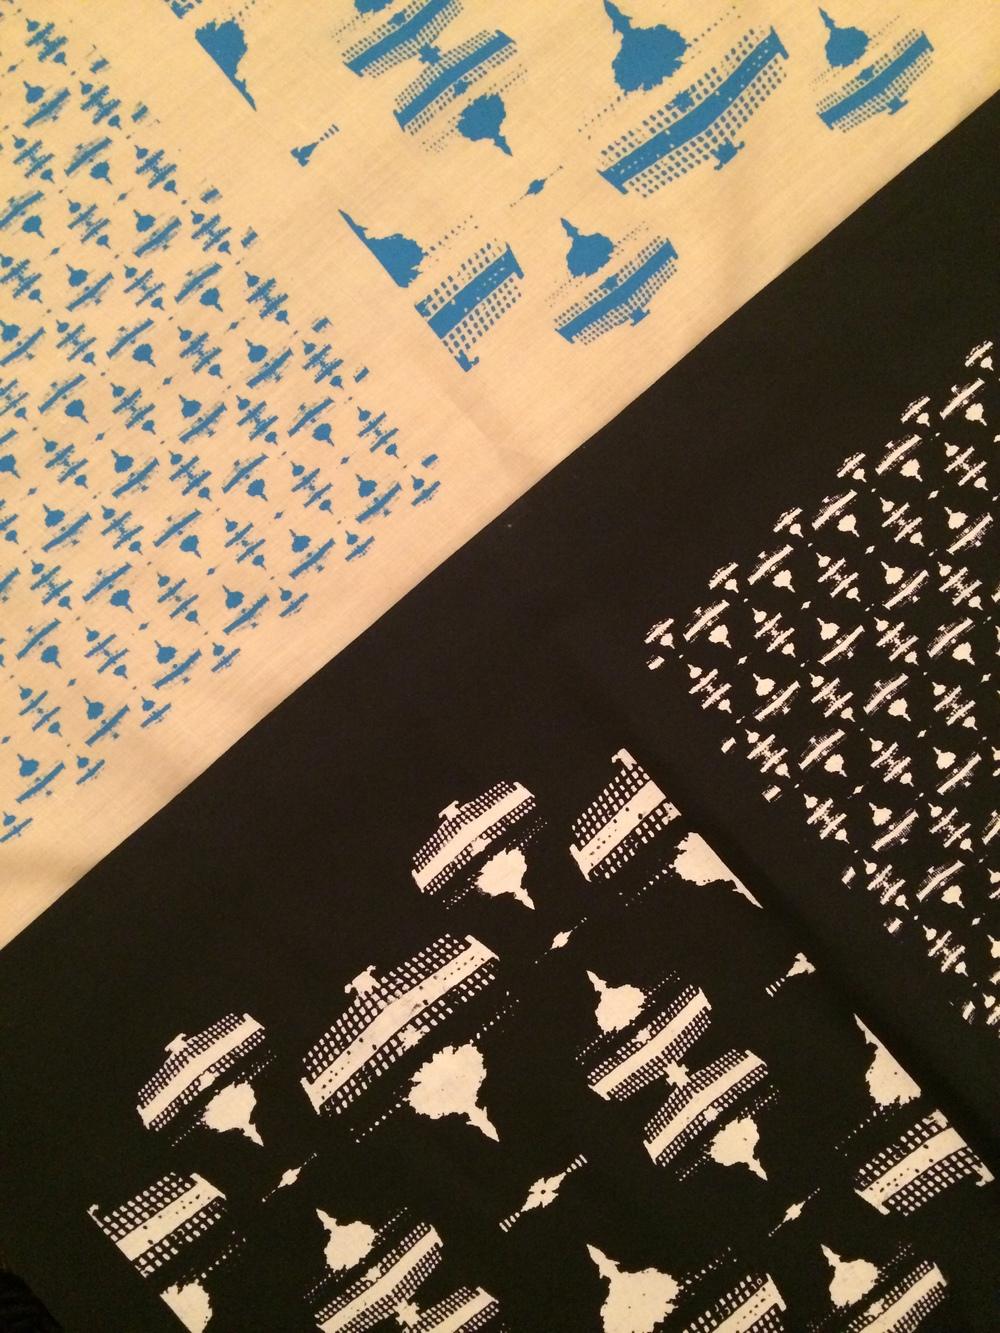 9/18 Test prints